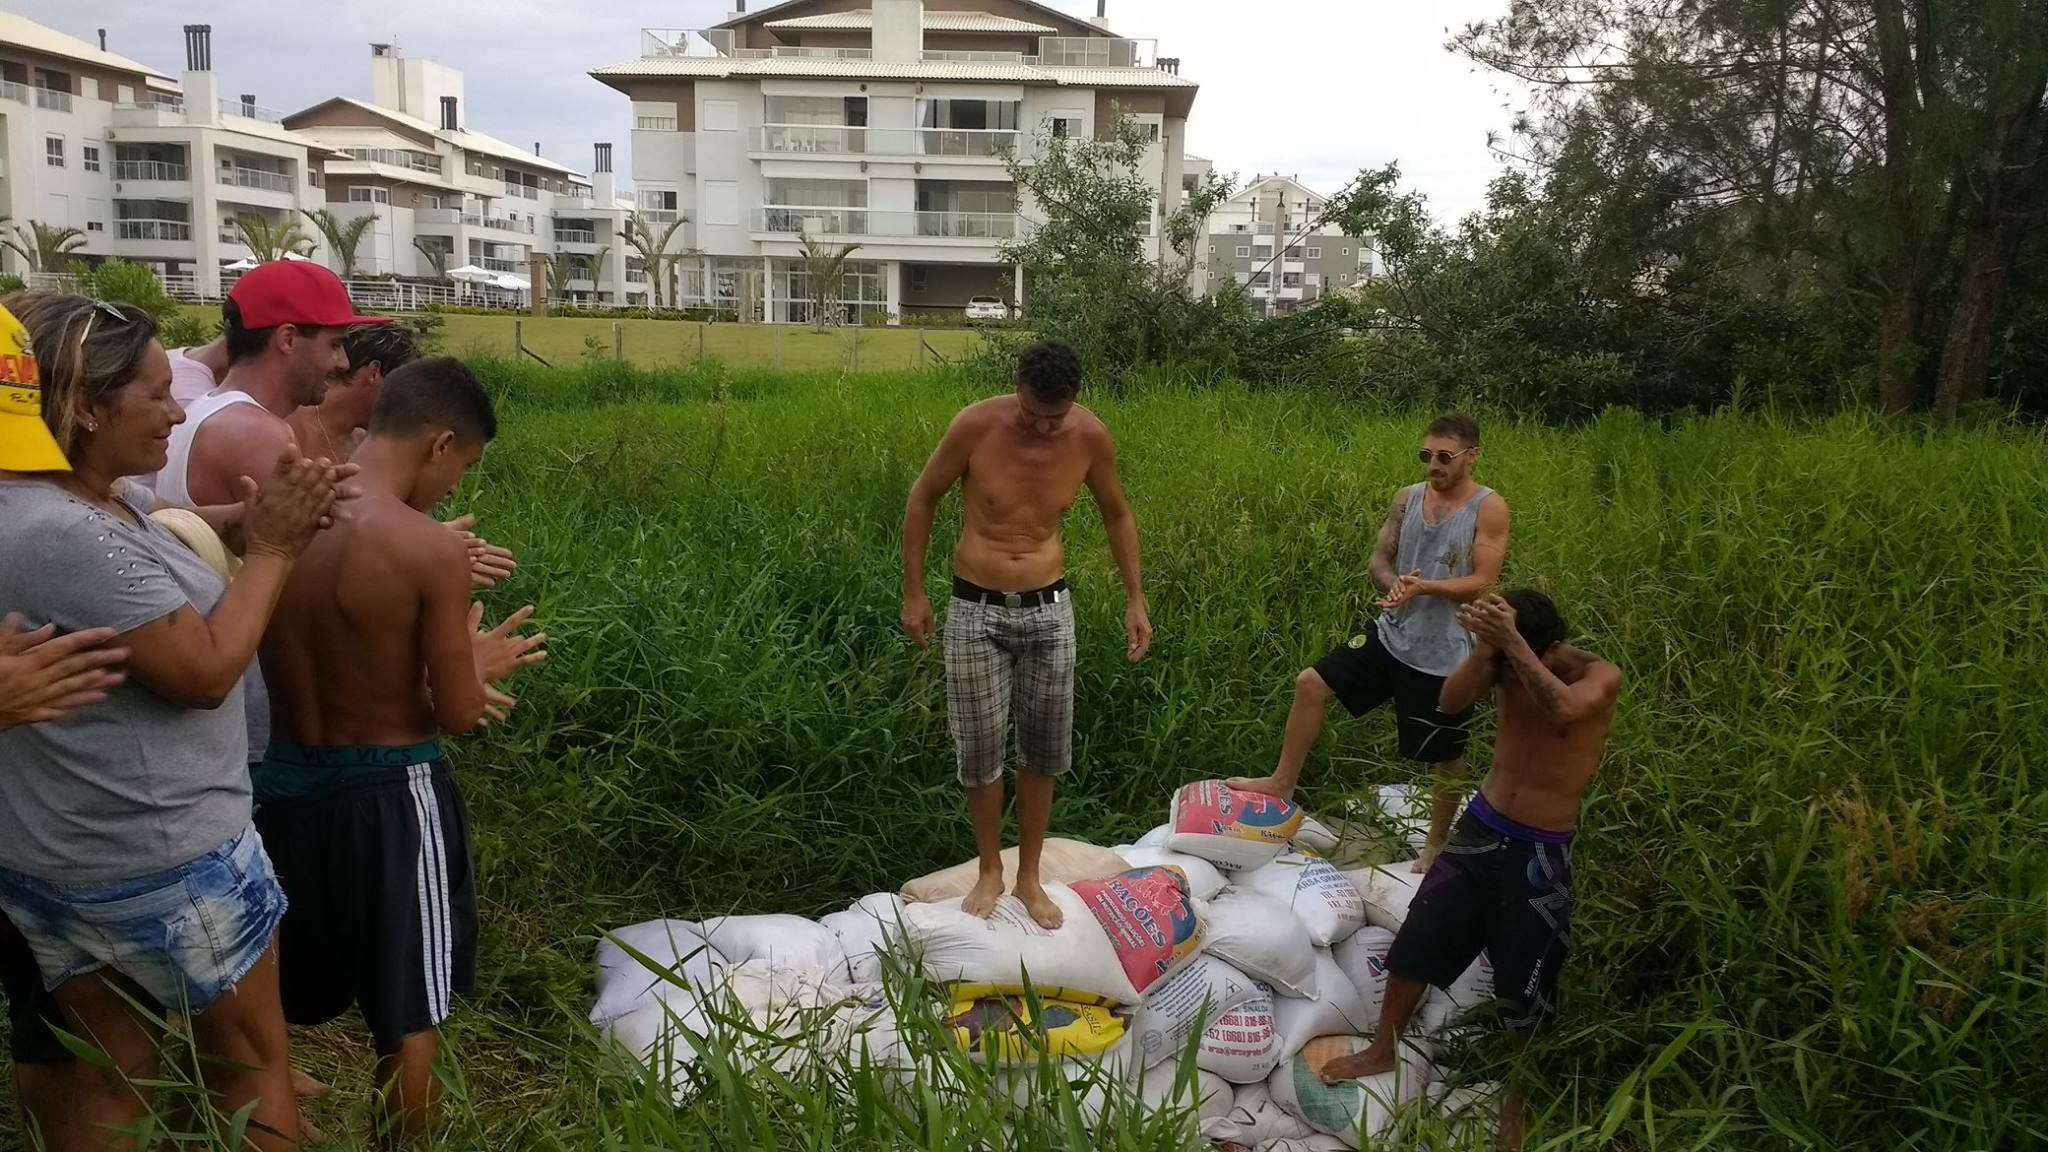 Moradores do Campeche fecham saídas irregulares de esgoto - Silézio Sabino/ND